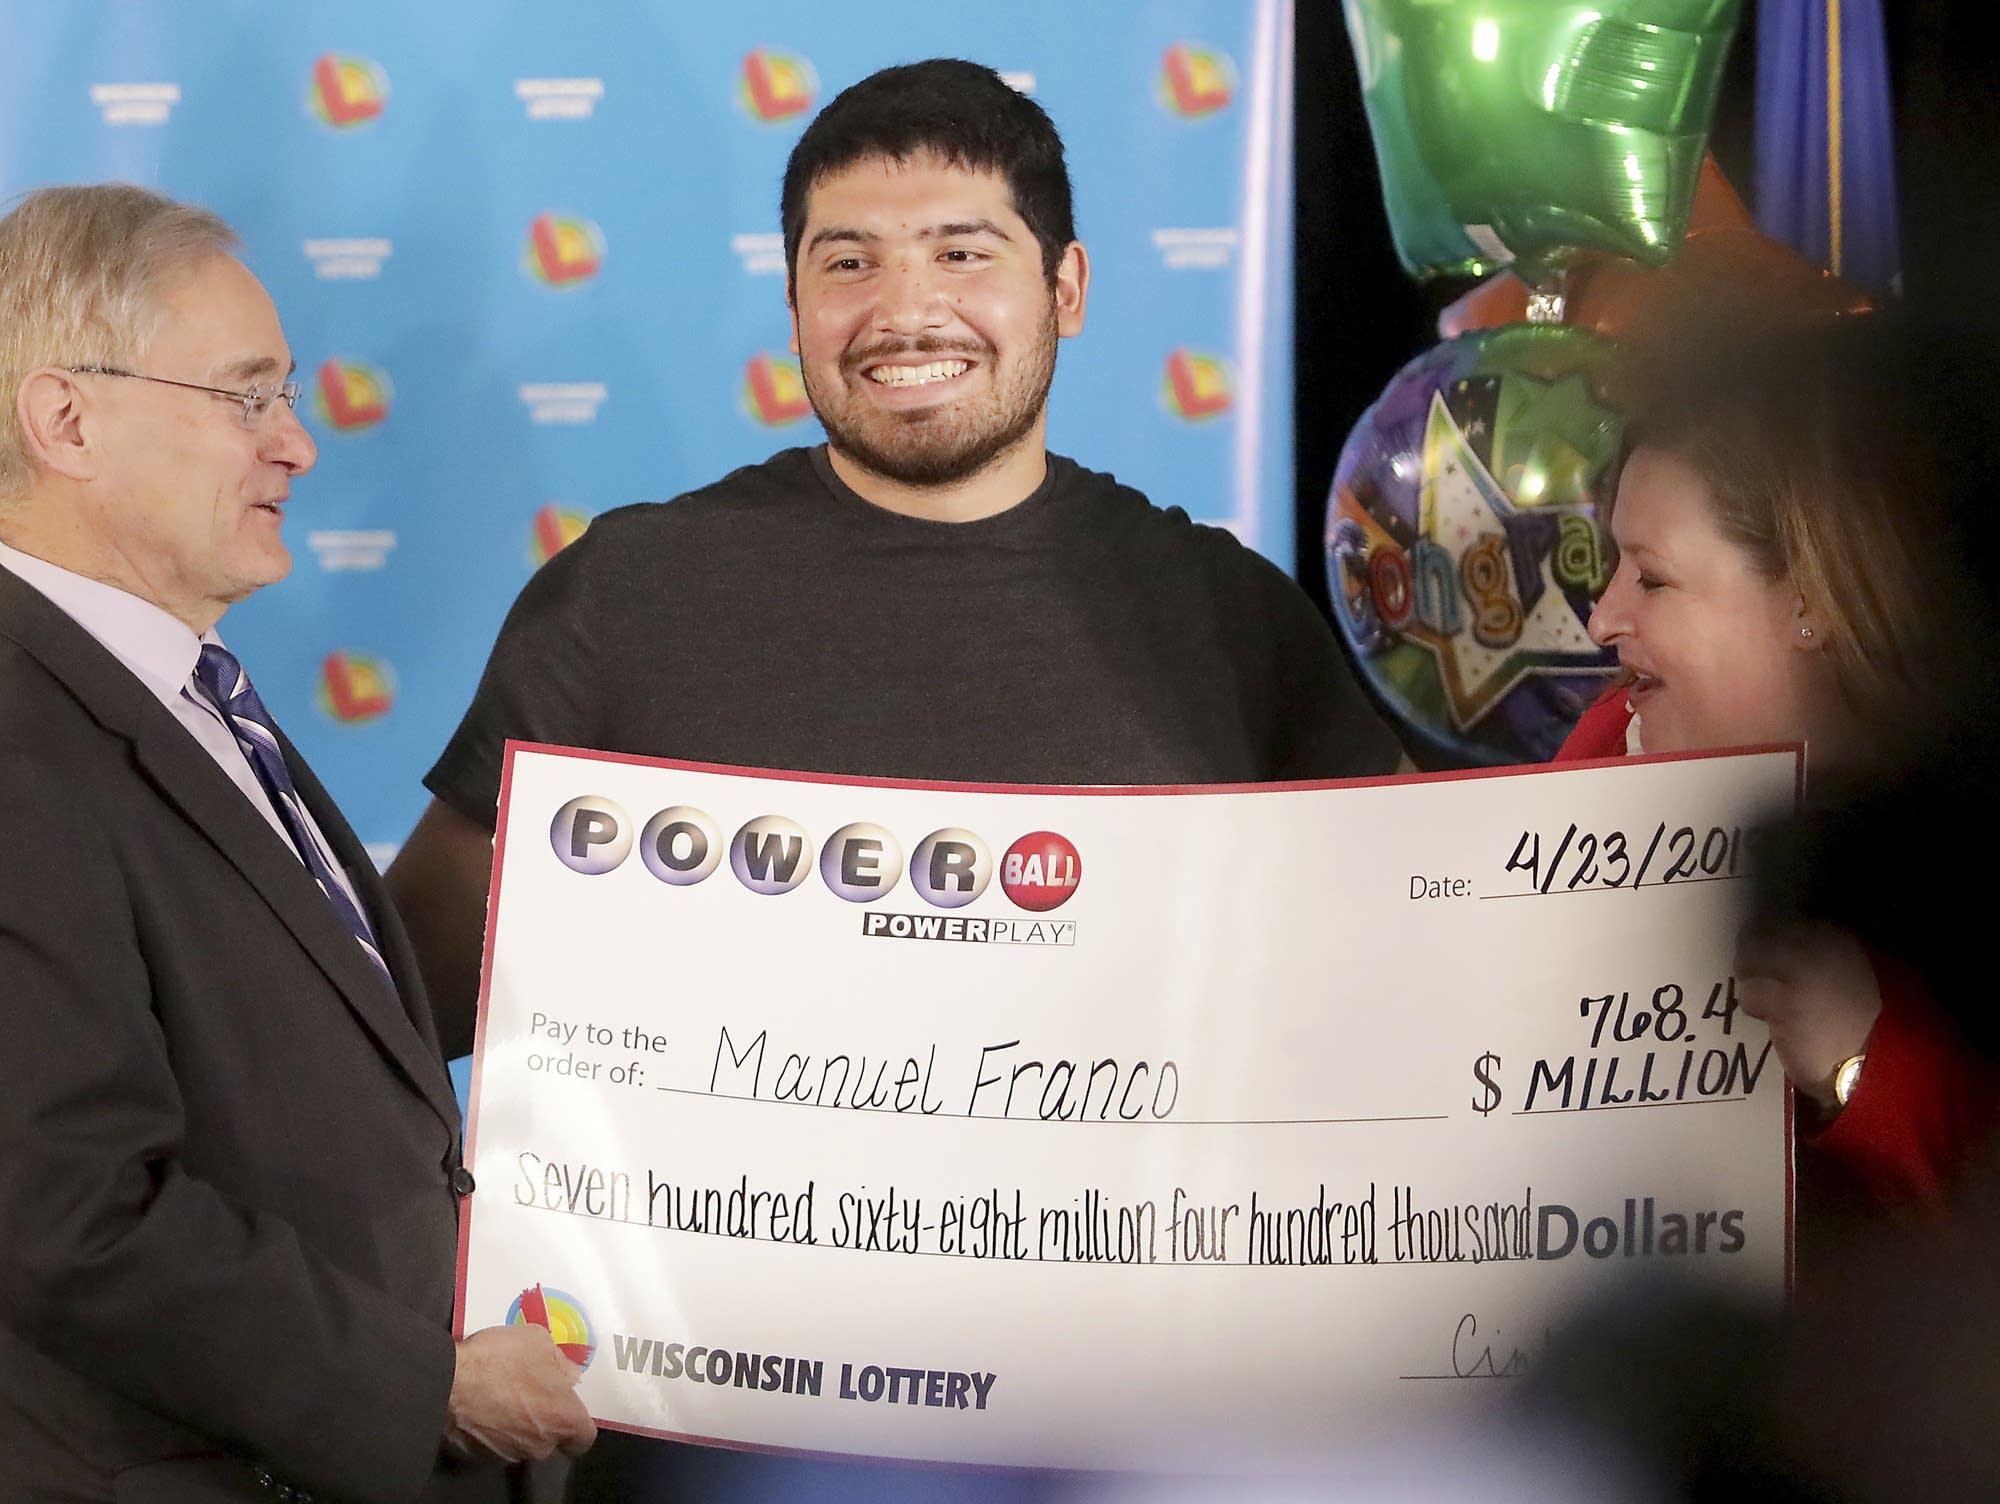 Powerball : no winner of Saturday's $635 million